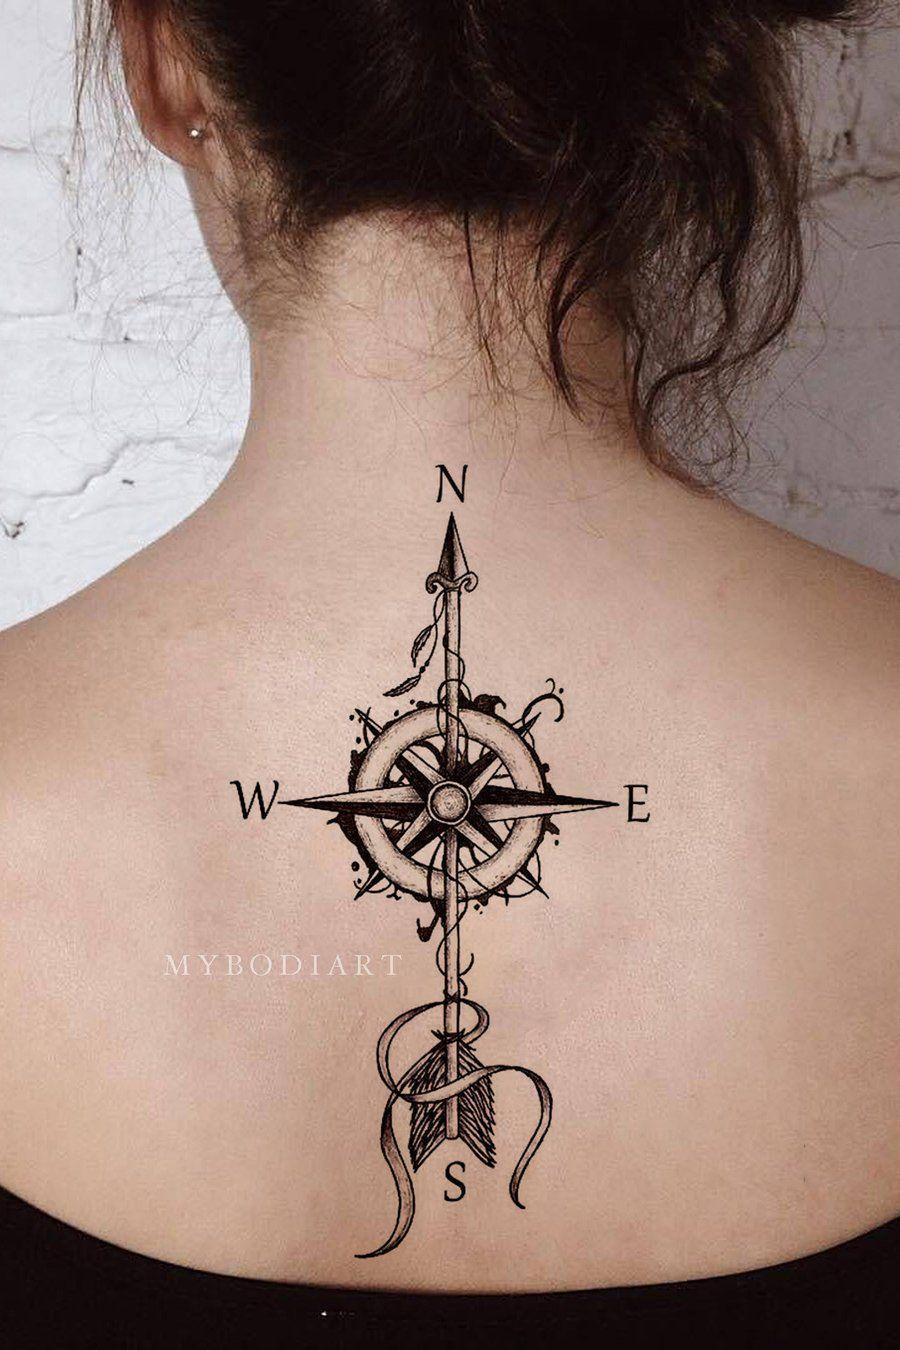 Wanderlust Compass Arrow Temporary Tattoo Tattoos For Women Arrow Tattoos Compass Tattoo